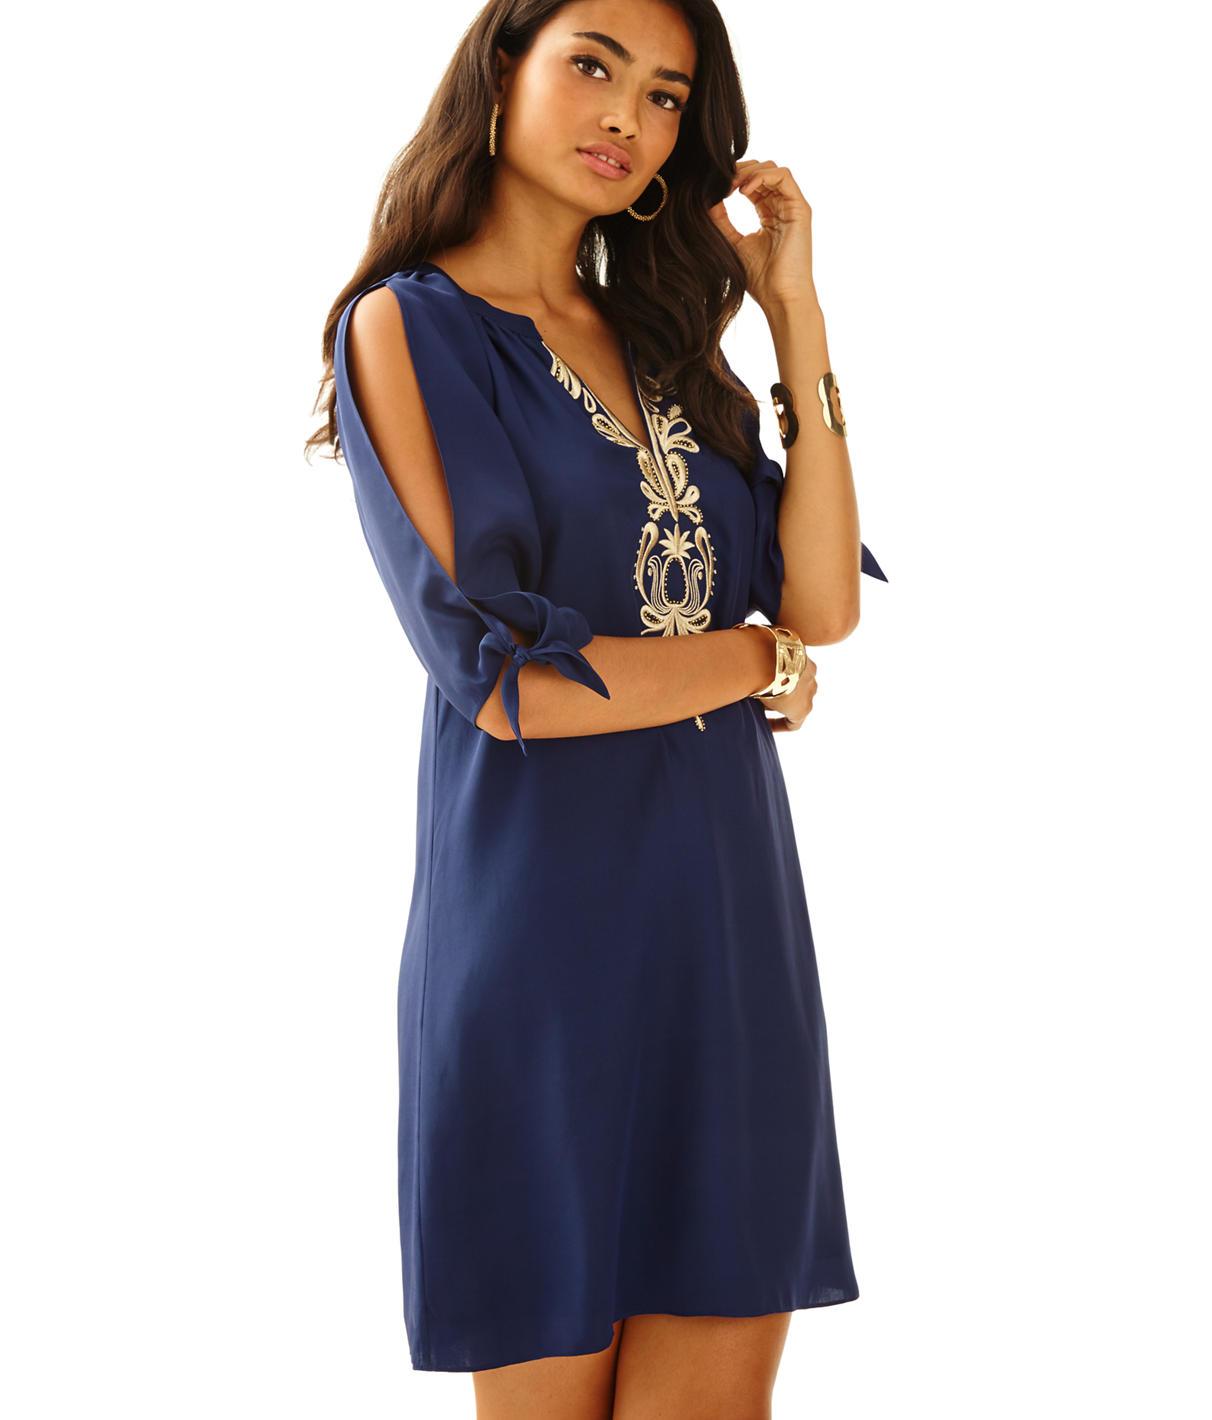 Lilly Pulitzer Bryce Tunic Dress